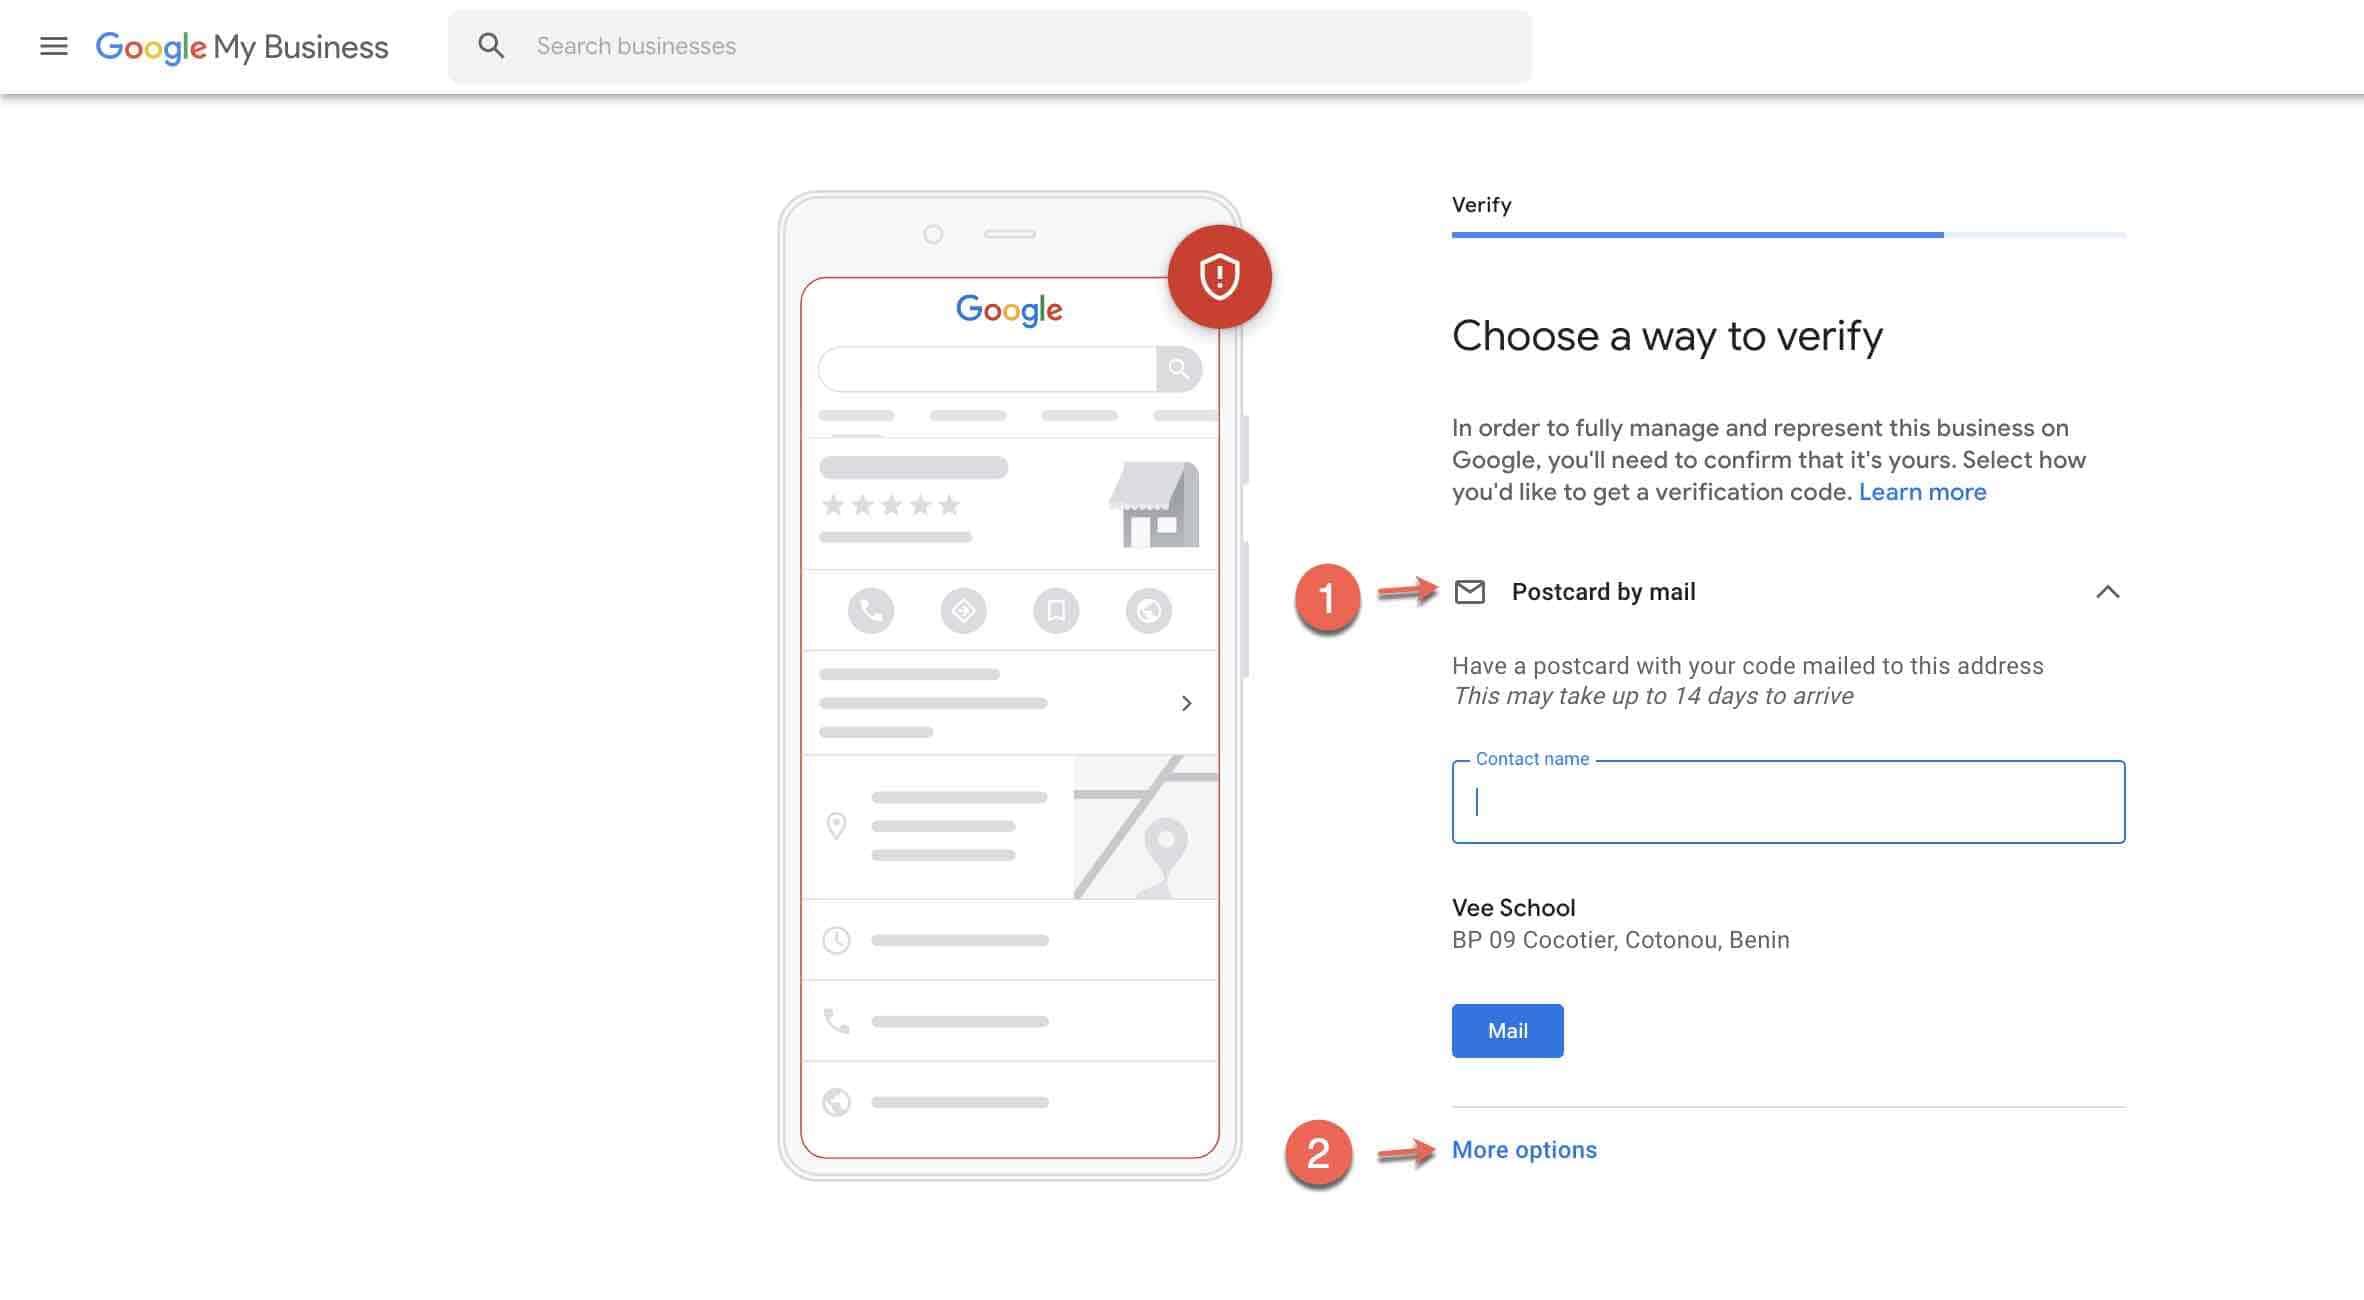 Set up google my business account - 3 verify by postcard